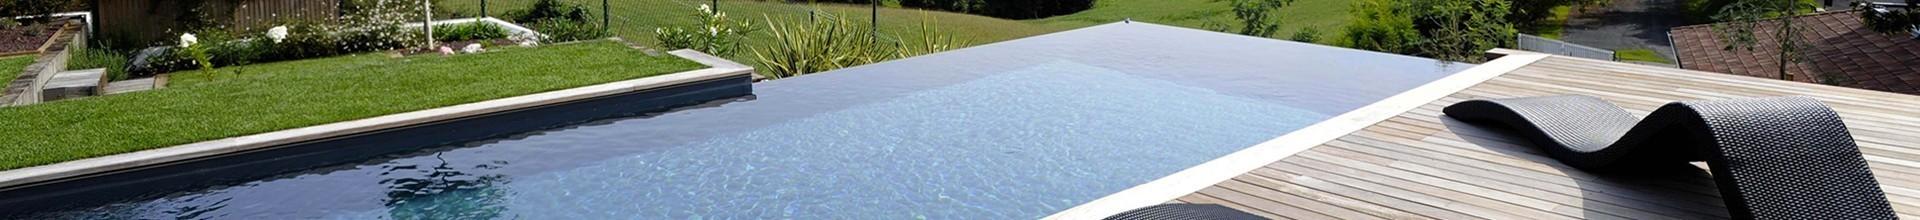 Direct usine, piscine coque prix Bas-Rhin